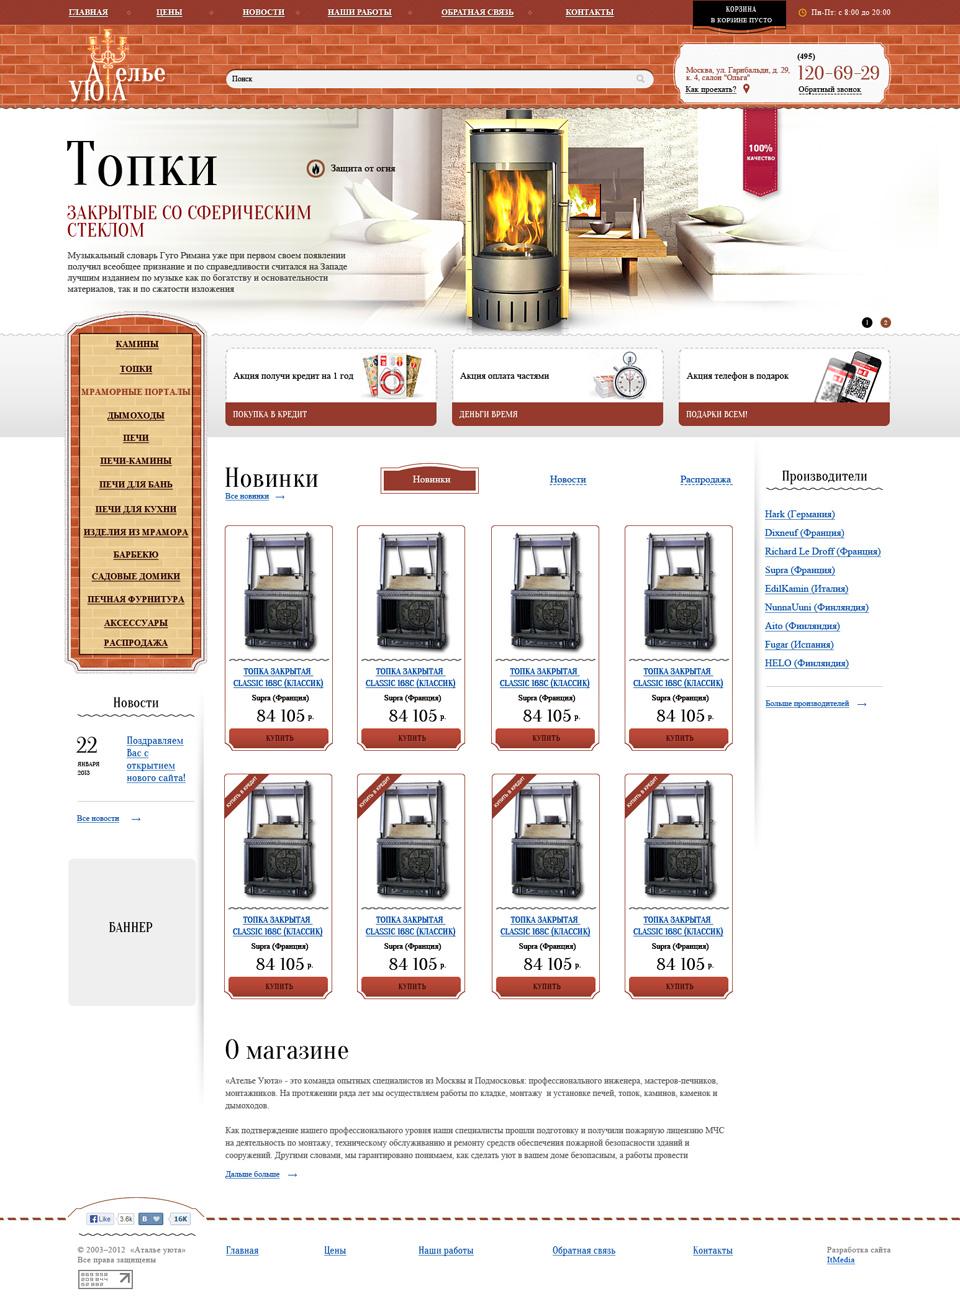 битрикс разработка сайтов